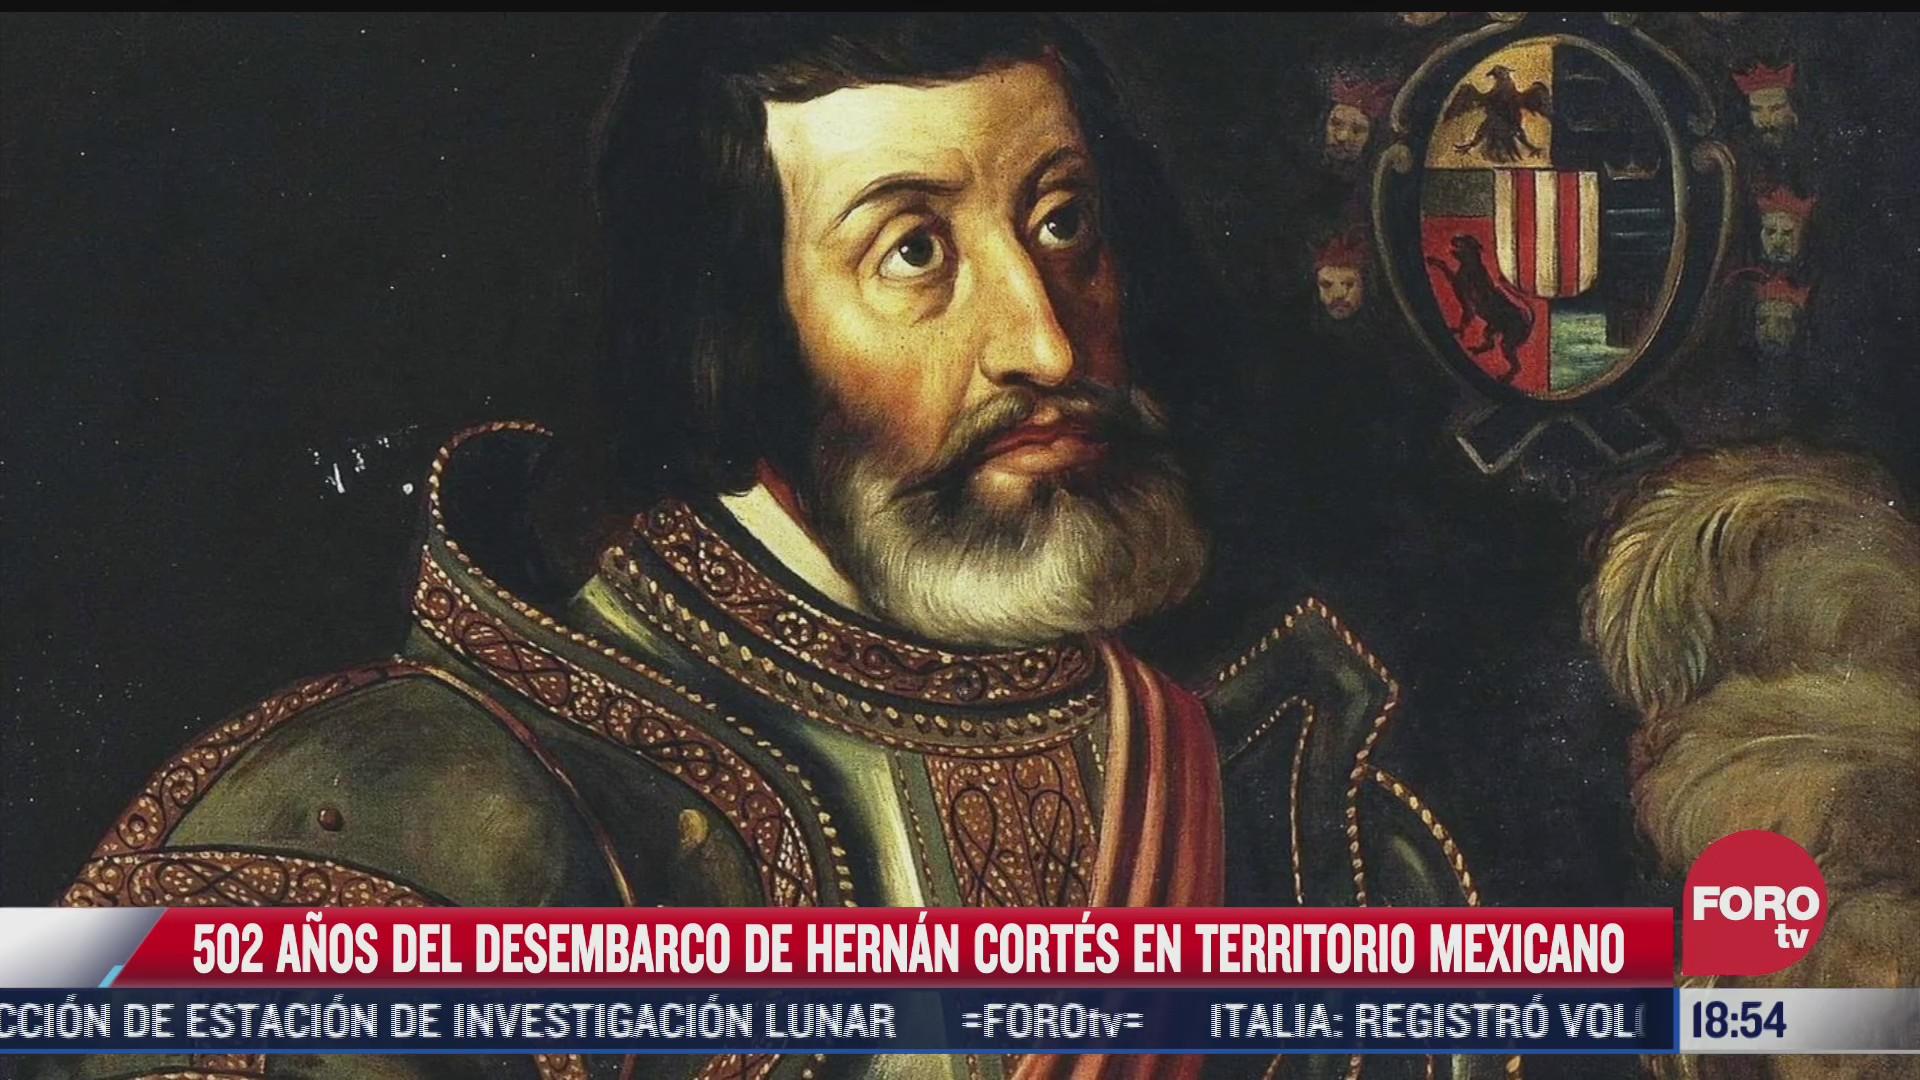 se cumplen 502 anos del desembarco de hernan cortes en territorio mexicano